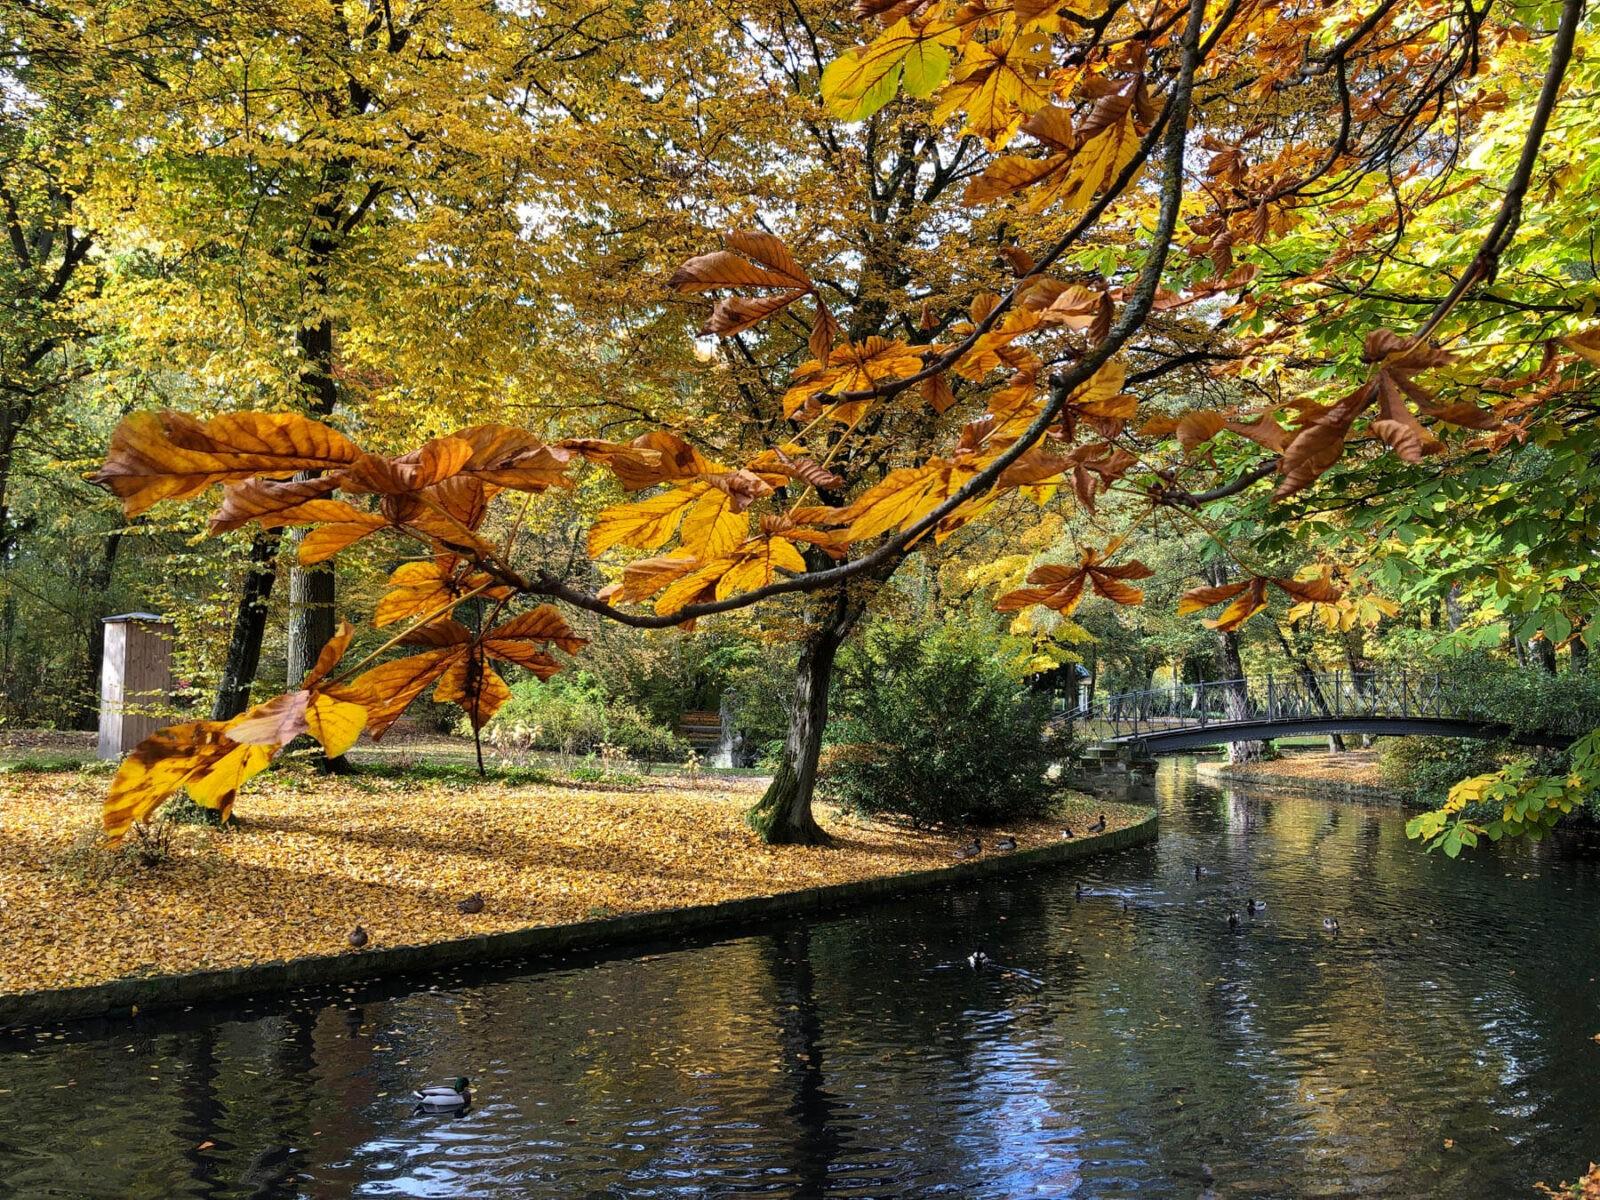 Parks in Bayreuth: Raus ins Grüne